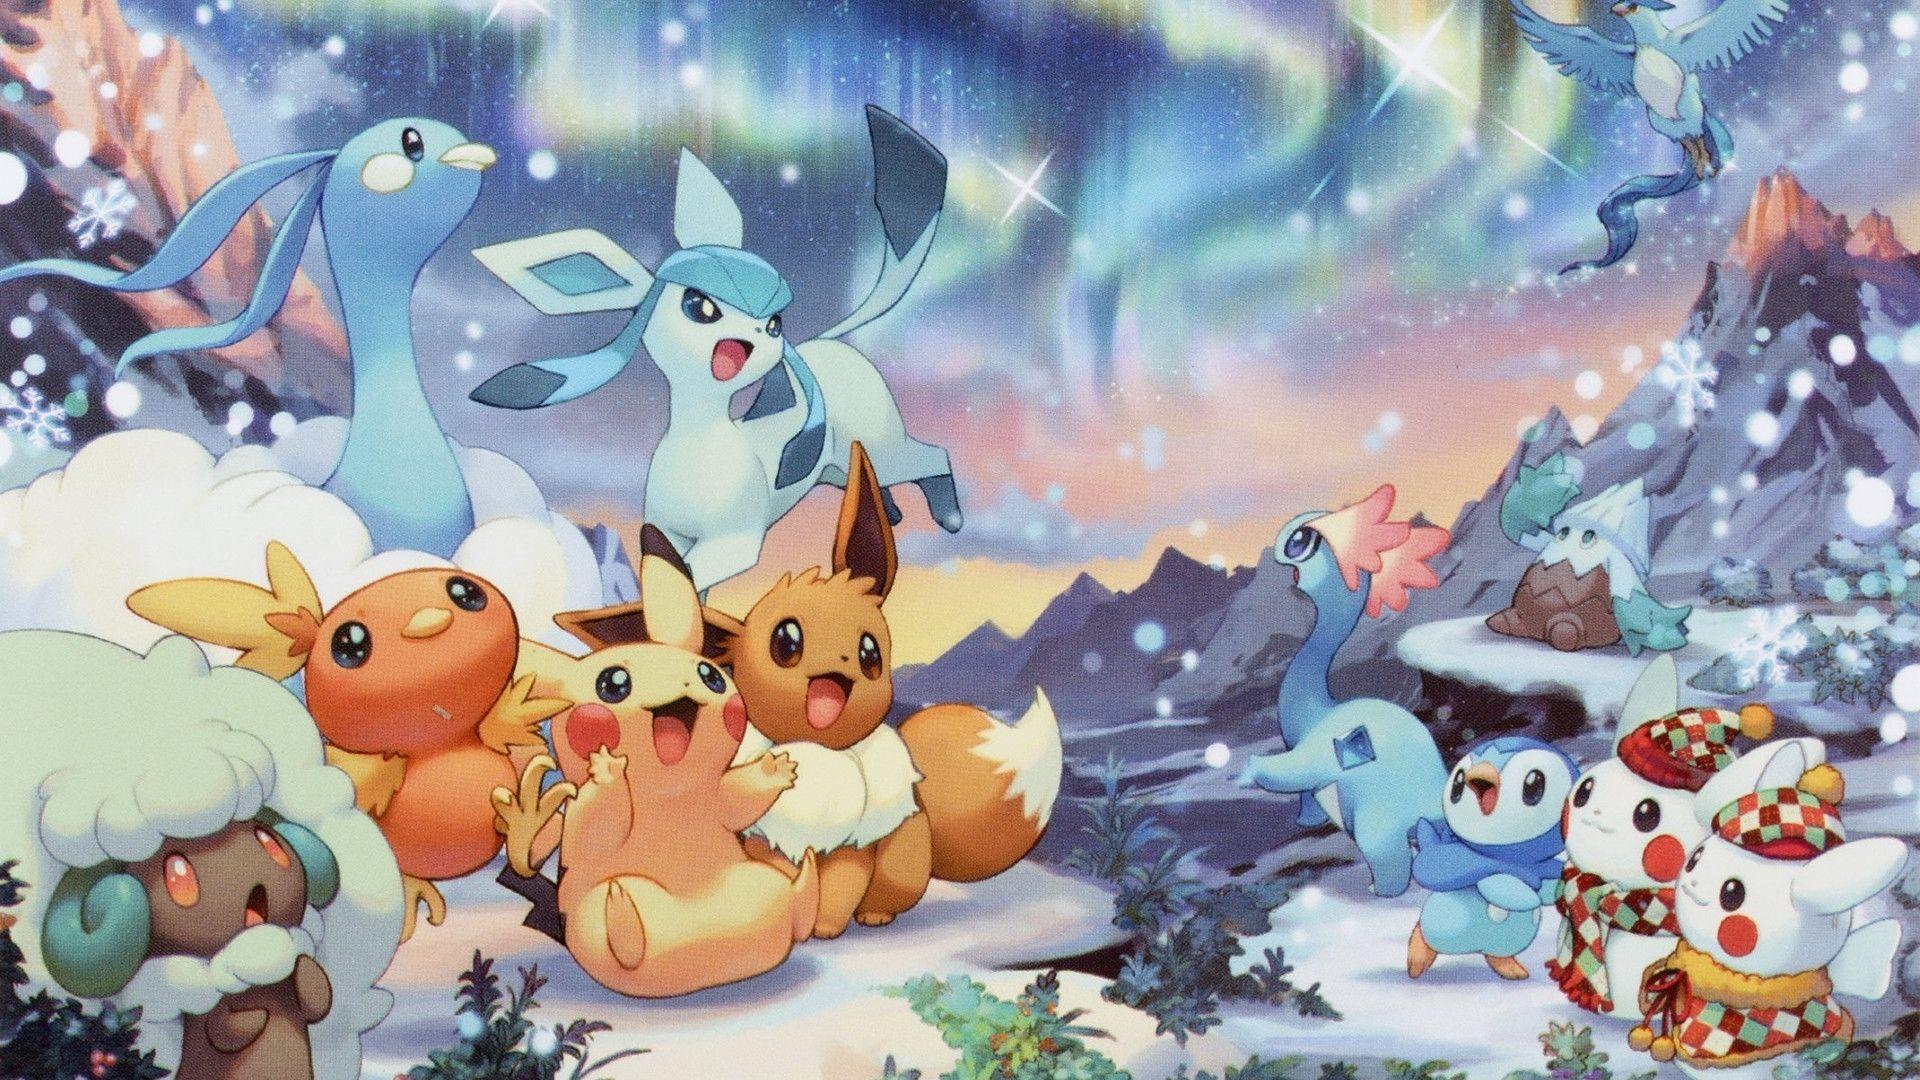 10 Most Popular Pokemon Christmas Wallpaper Hd Full Hd 1080p For Pc Desktop Pikachu Wallpaper Christmas Wallpaper Hd Cute Pokemon Wallpaper